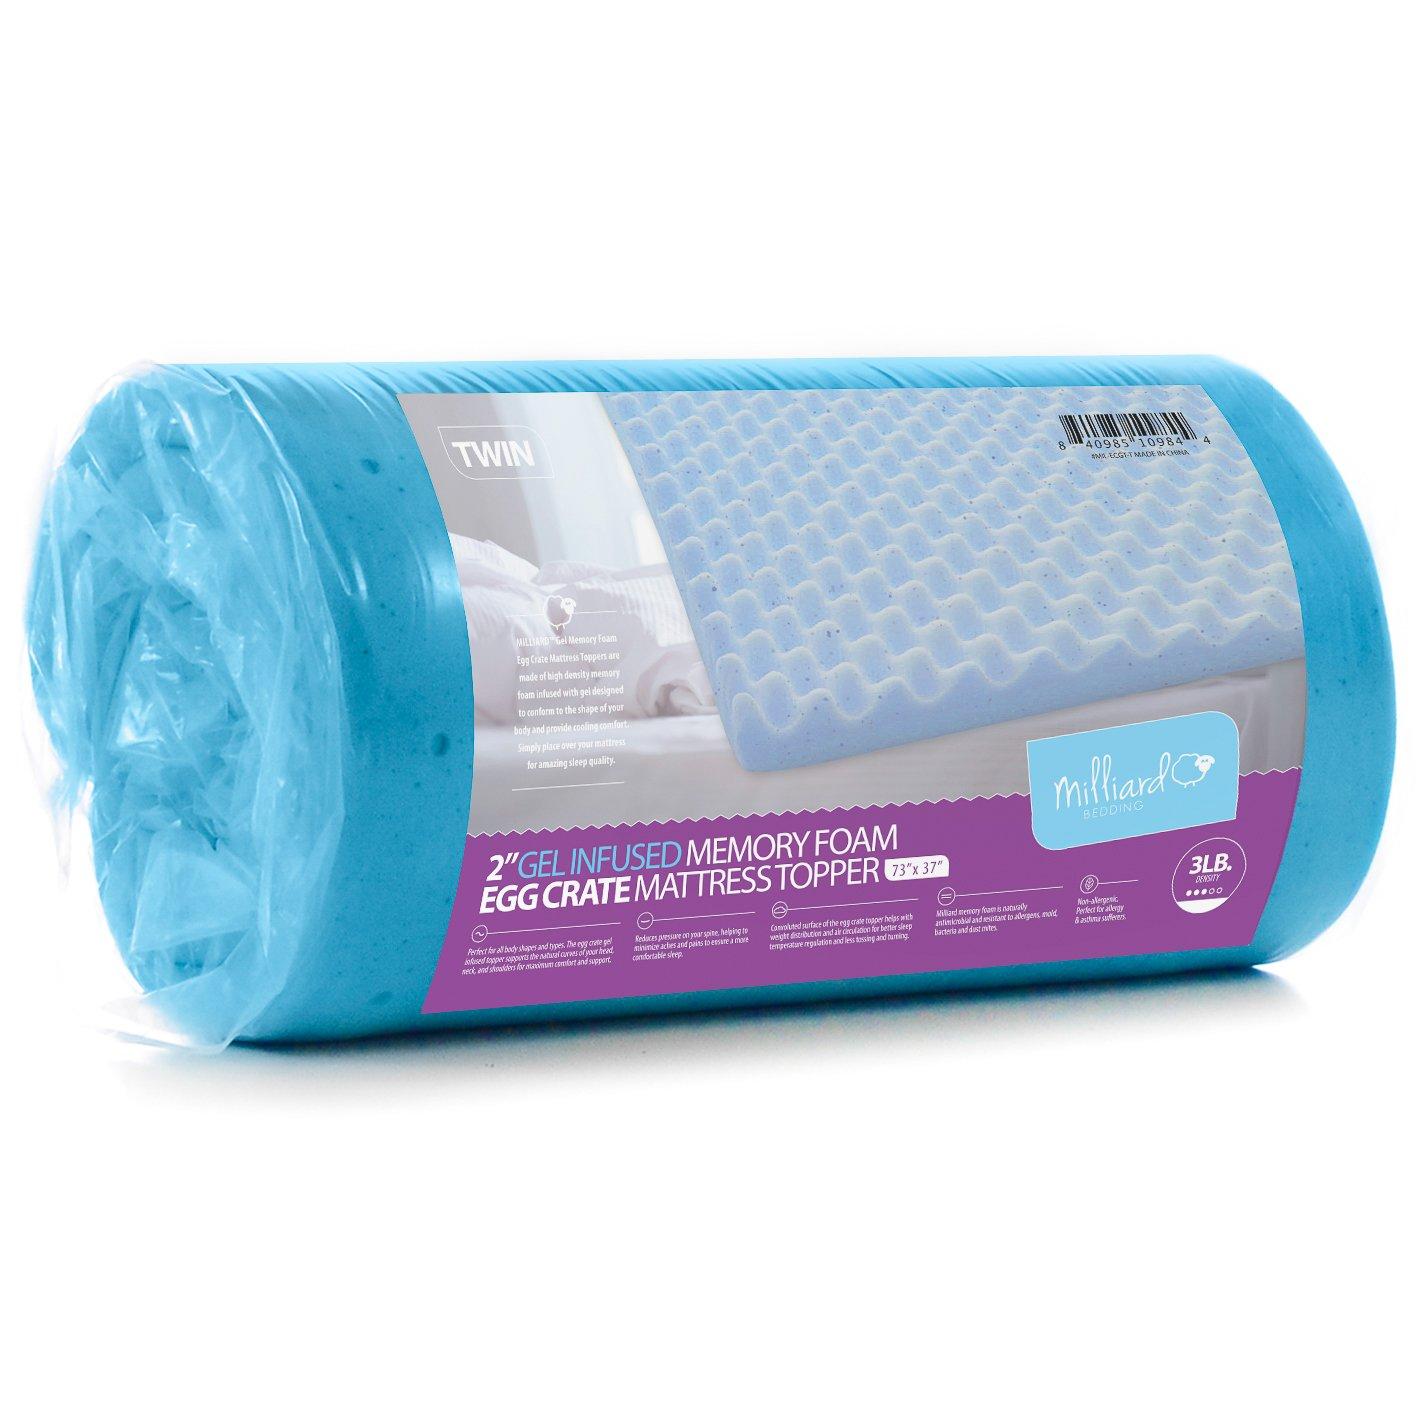 Milliard 2in. Egg Crate Gel Memory Foam Mattress Topper ...